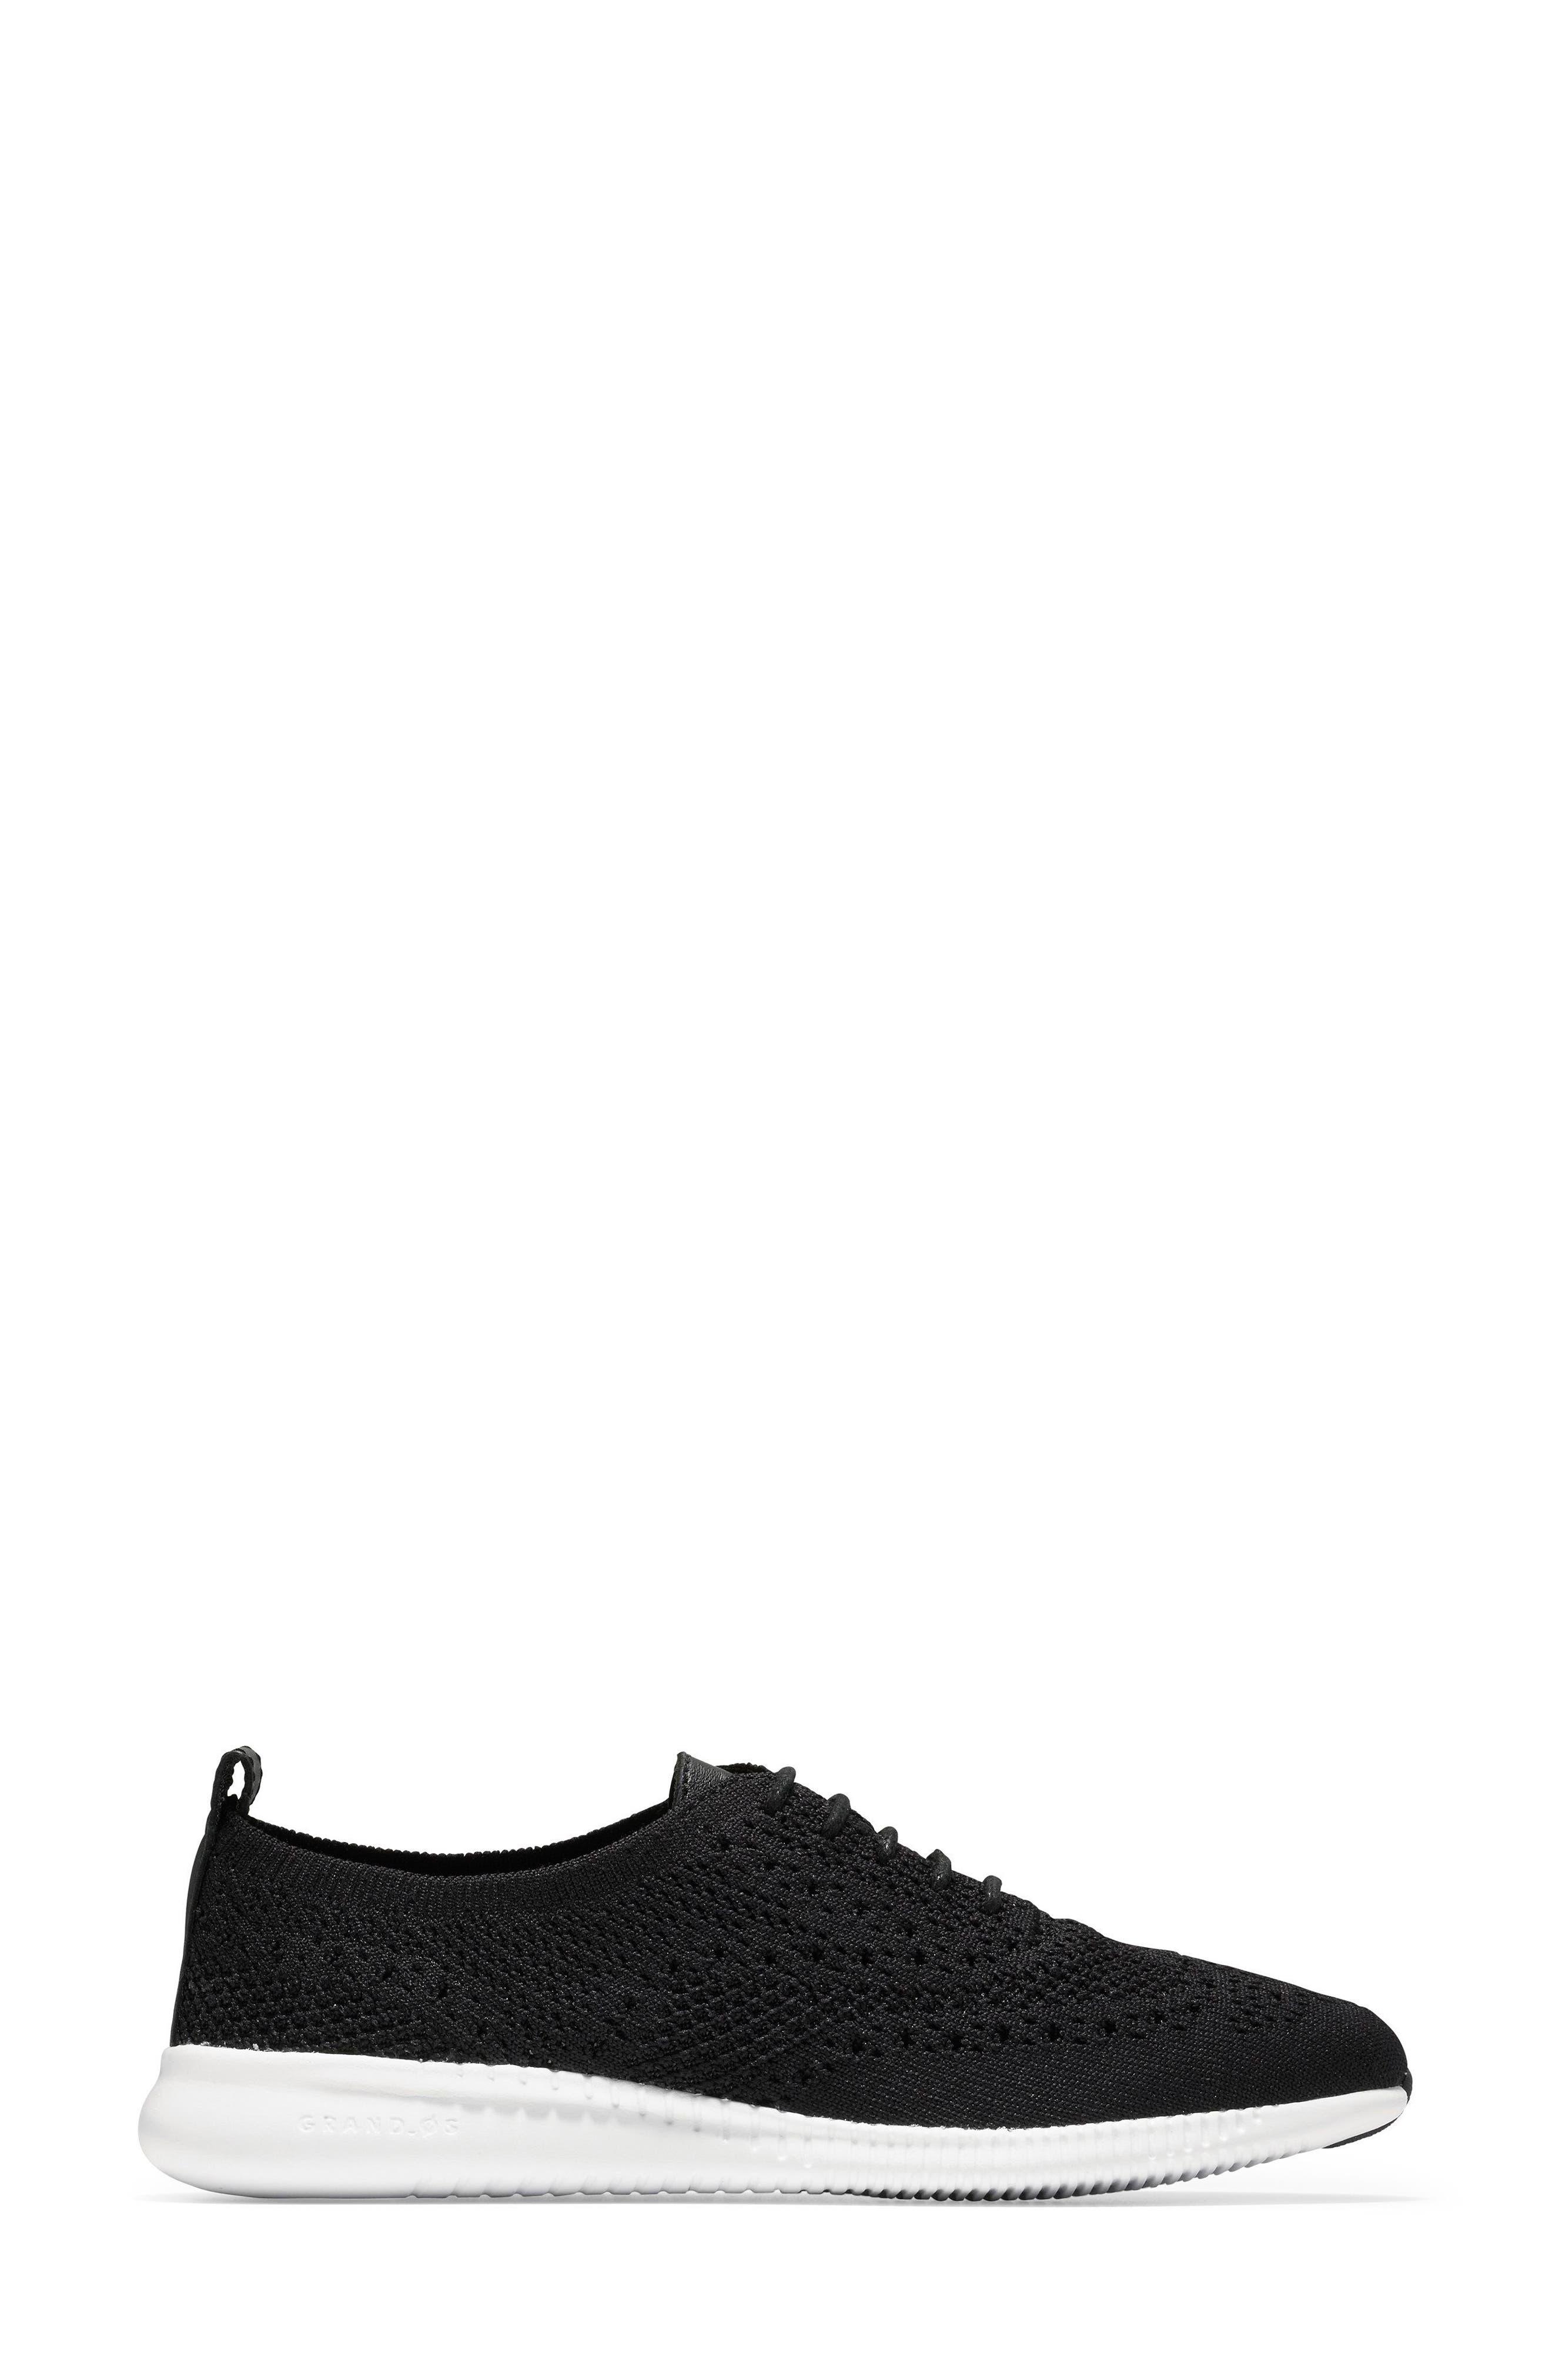 2.ZERØGRAND Stitchlite Wingtip Sneaker,                             Alternate thumbnail 3, color,                             001